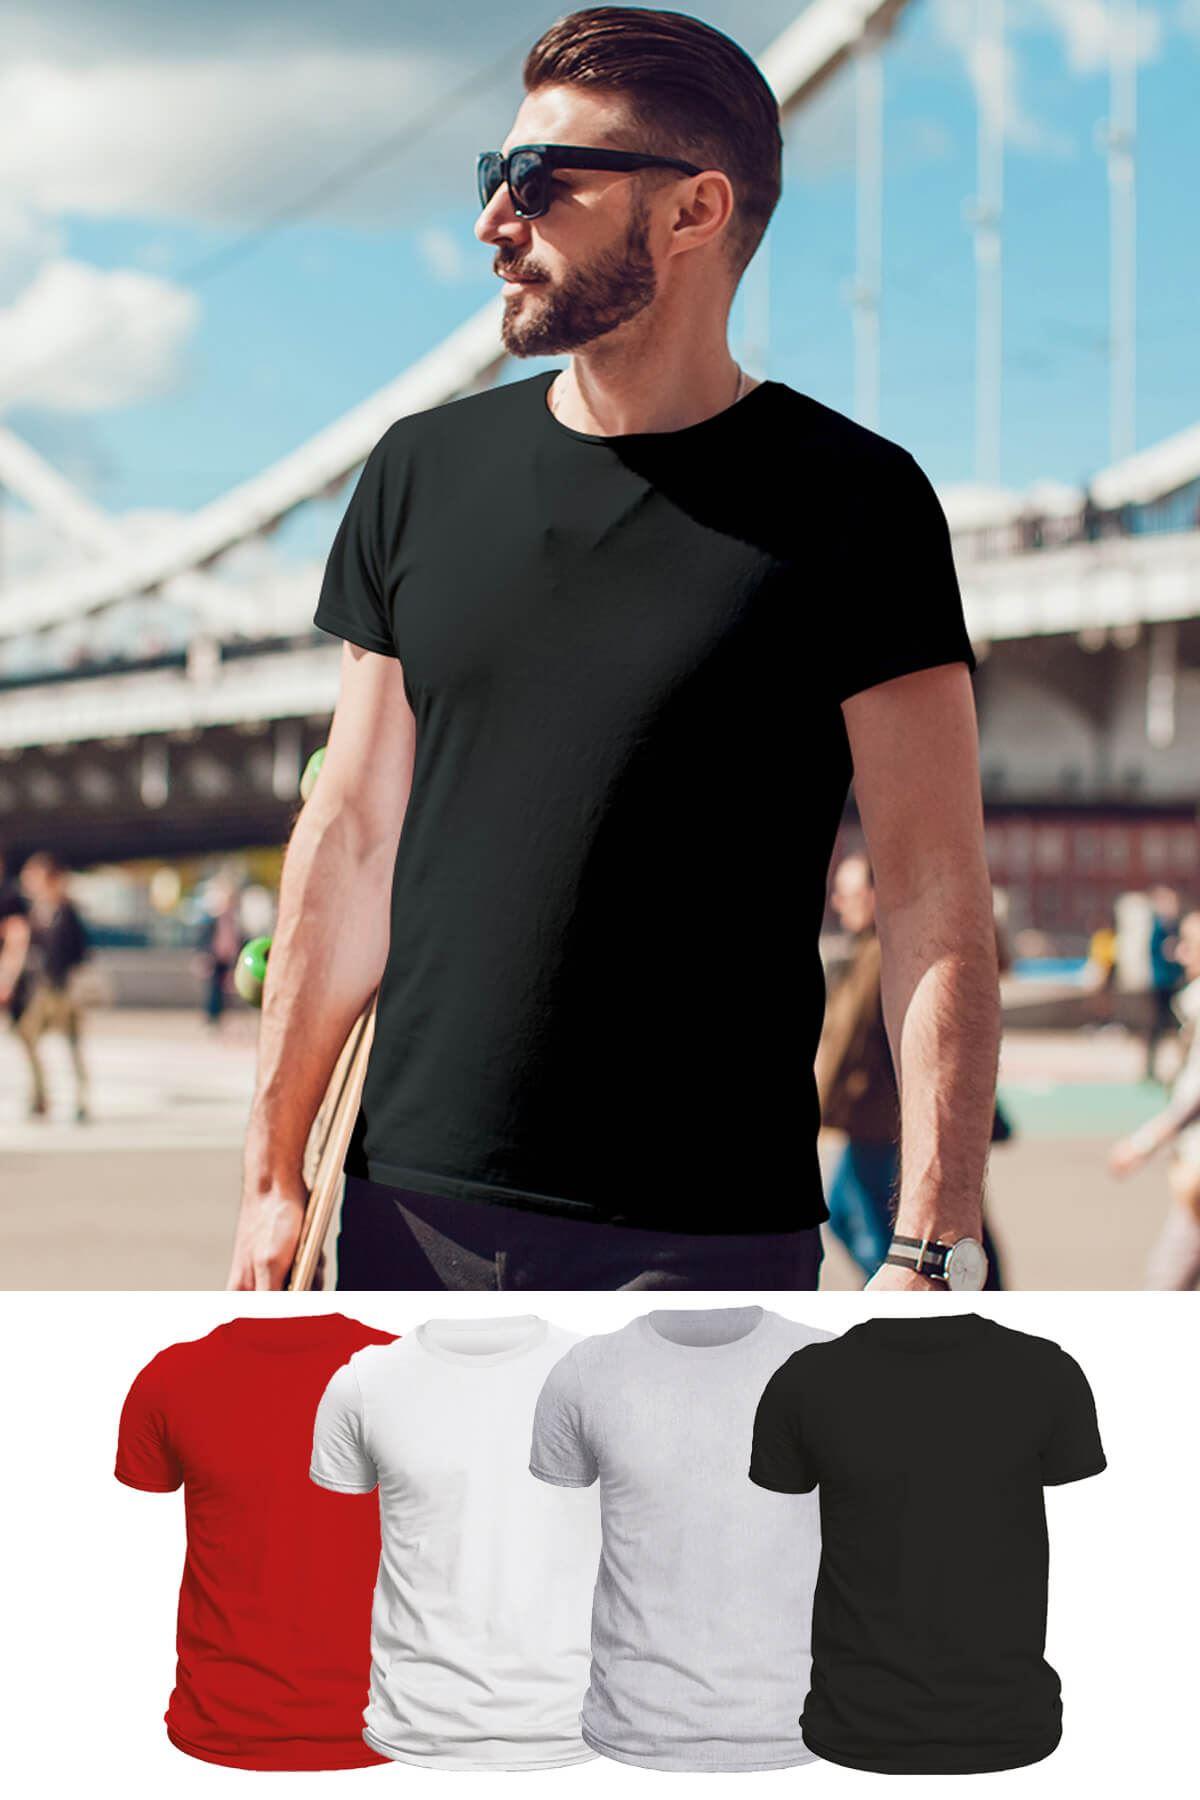 Tonny Mood Siyah - Beyaz- Gri Melanj- Kırmızı  4'lü Set Basic Erkek Tshirt - Tişört